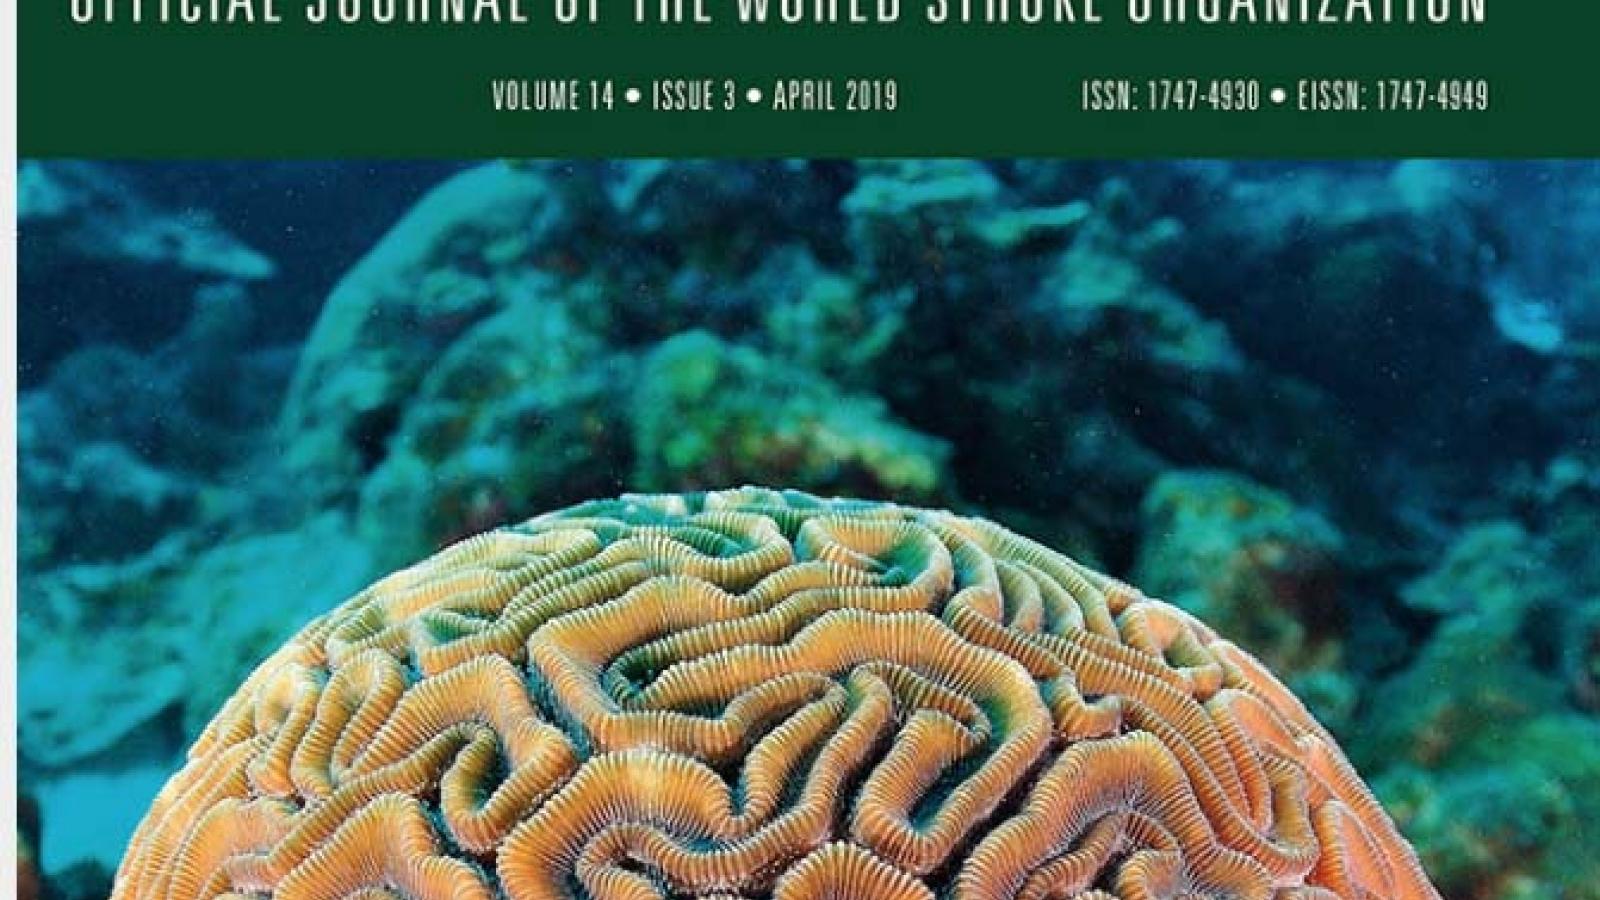 Informal caregivers in stroke: life impact, support and psychological well-being - a Swedish Stroke Register (Riksstroke) study with Stefan Sennfalt